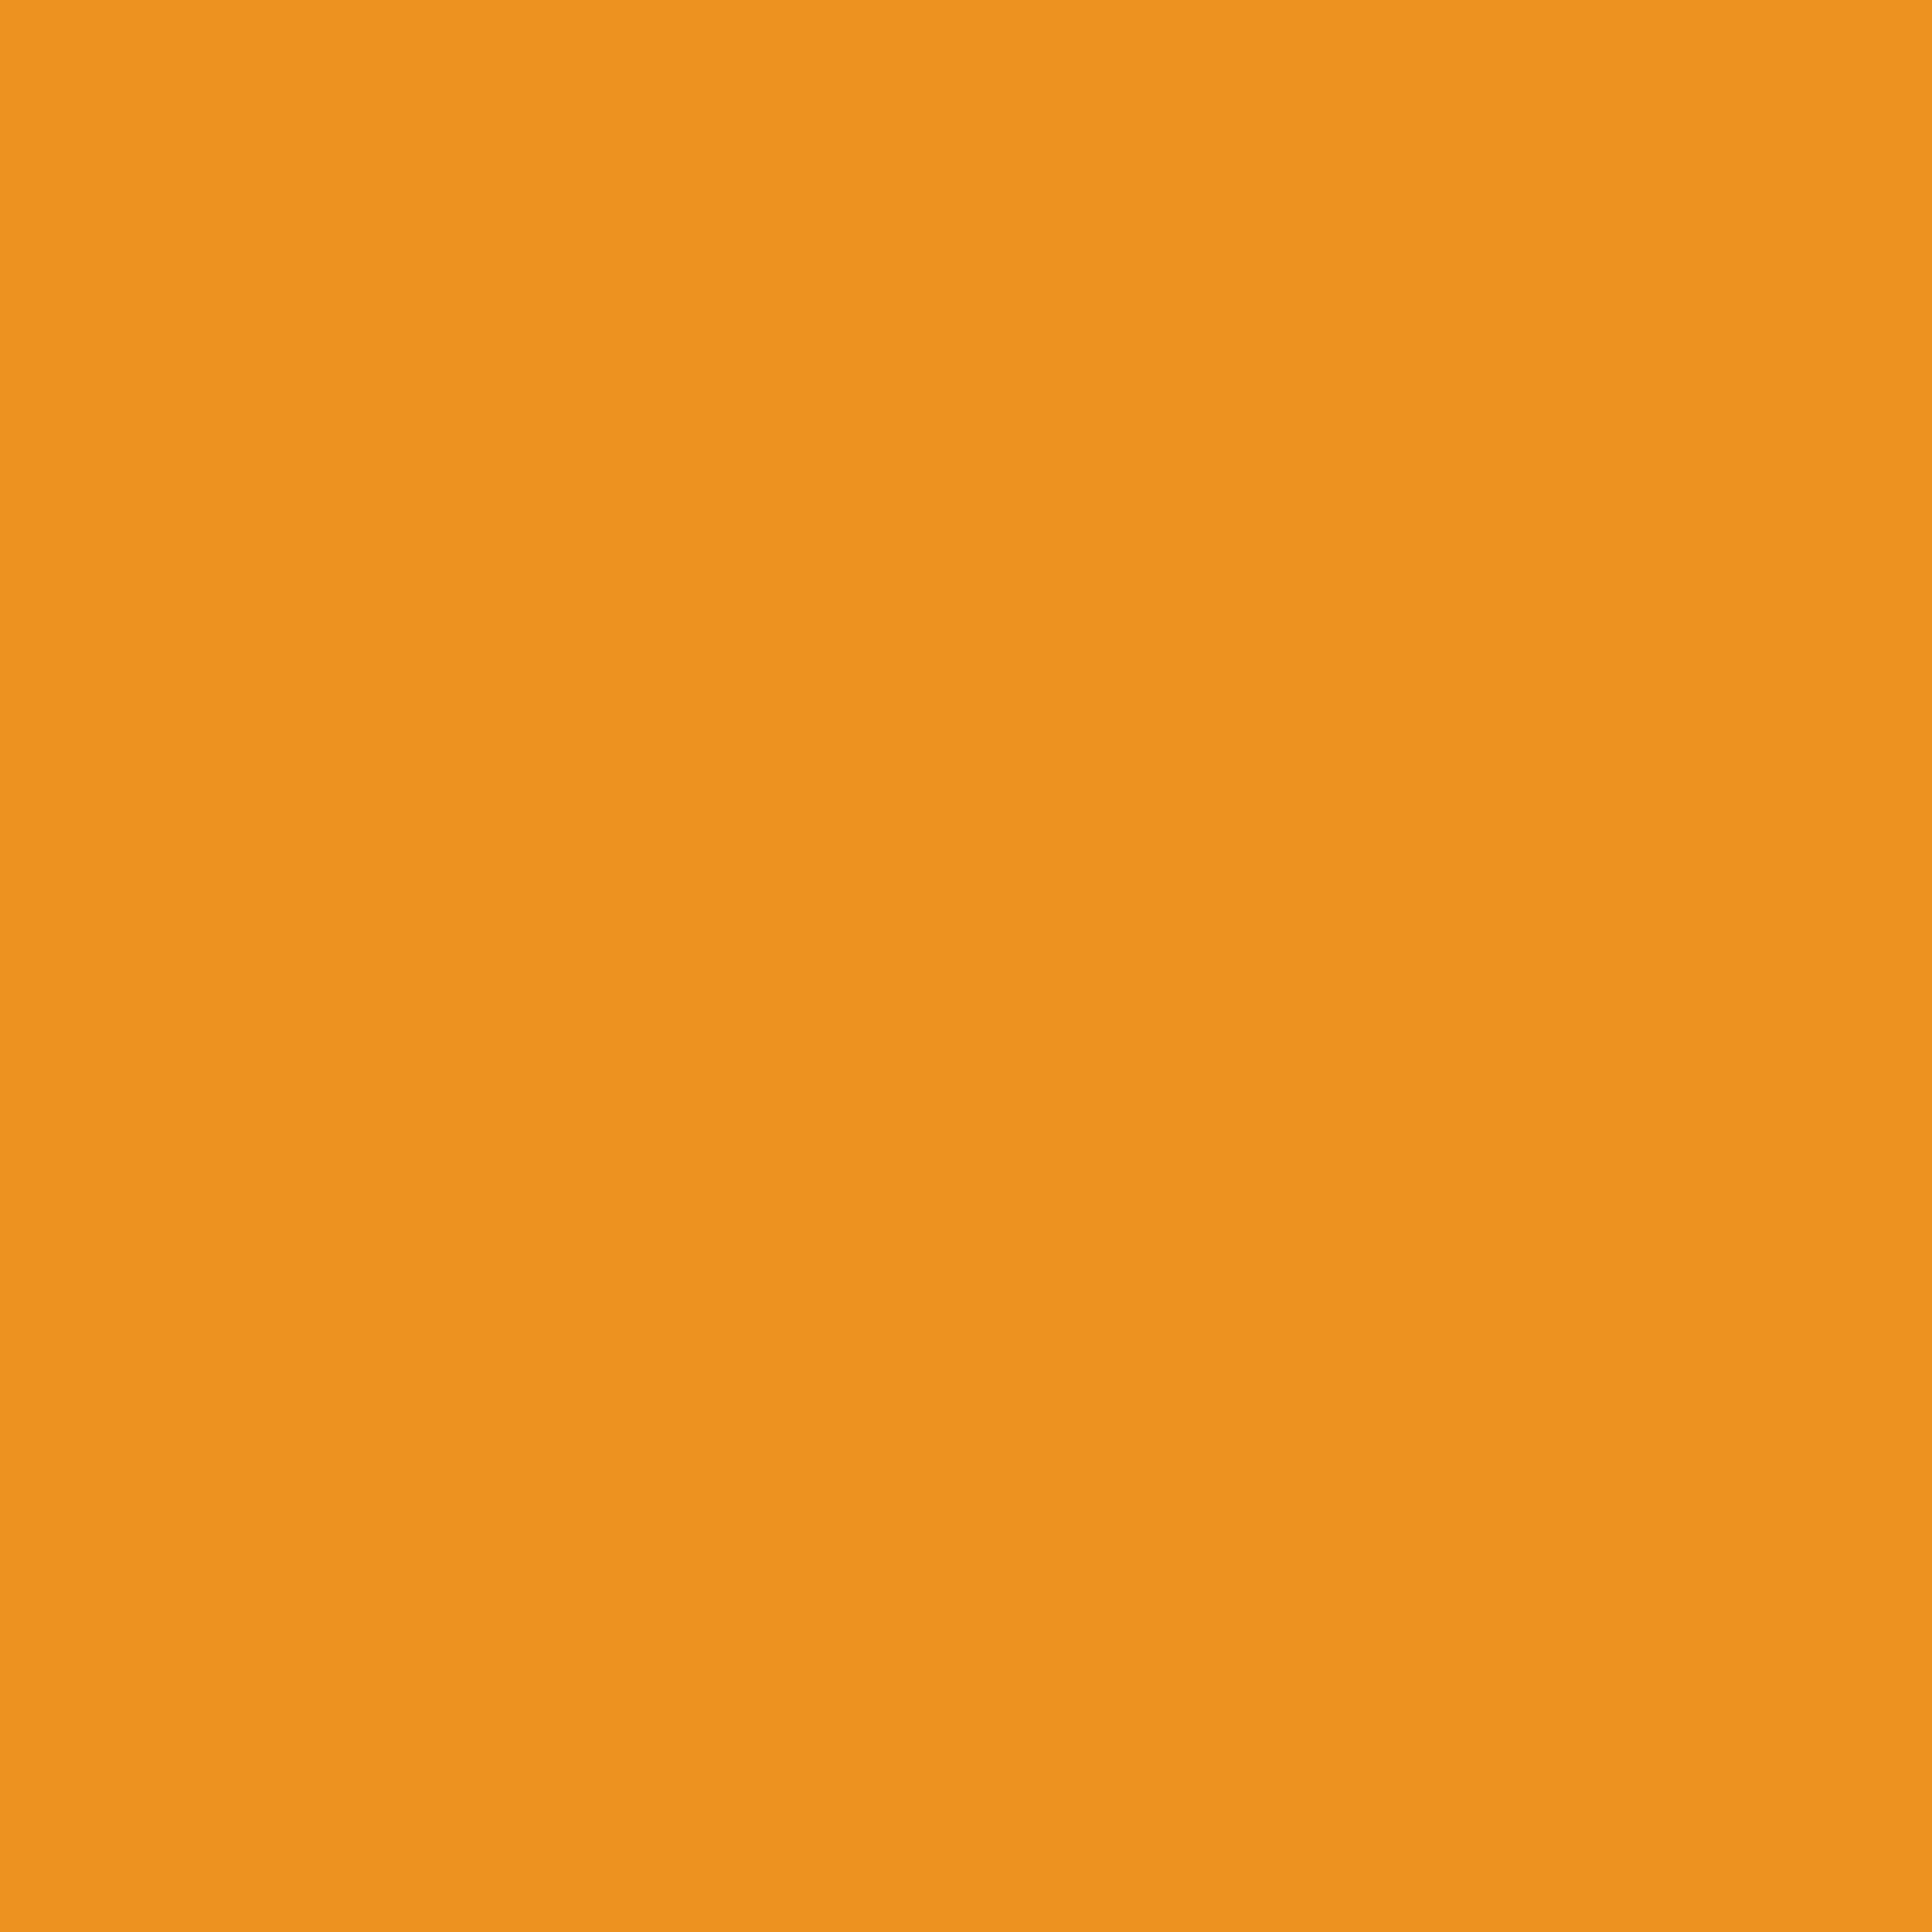 3600x3600 Carrot Orange Solid Color Background